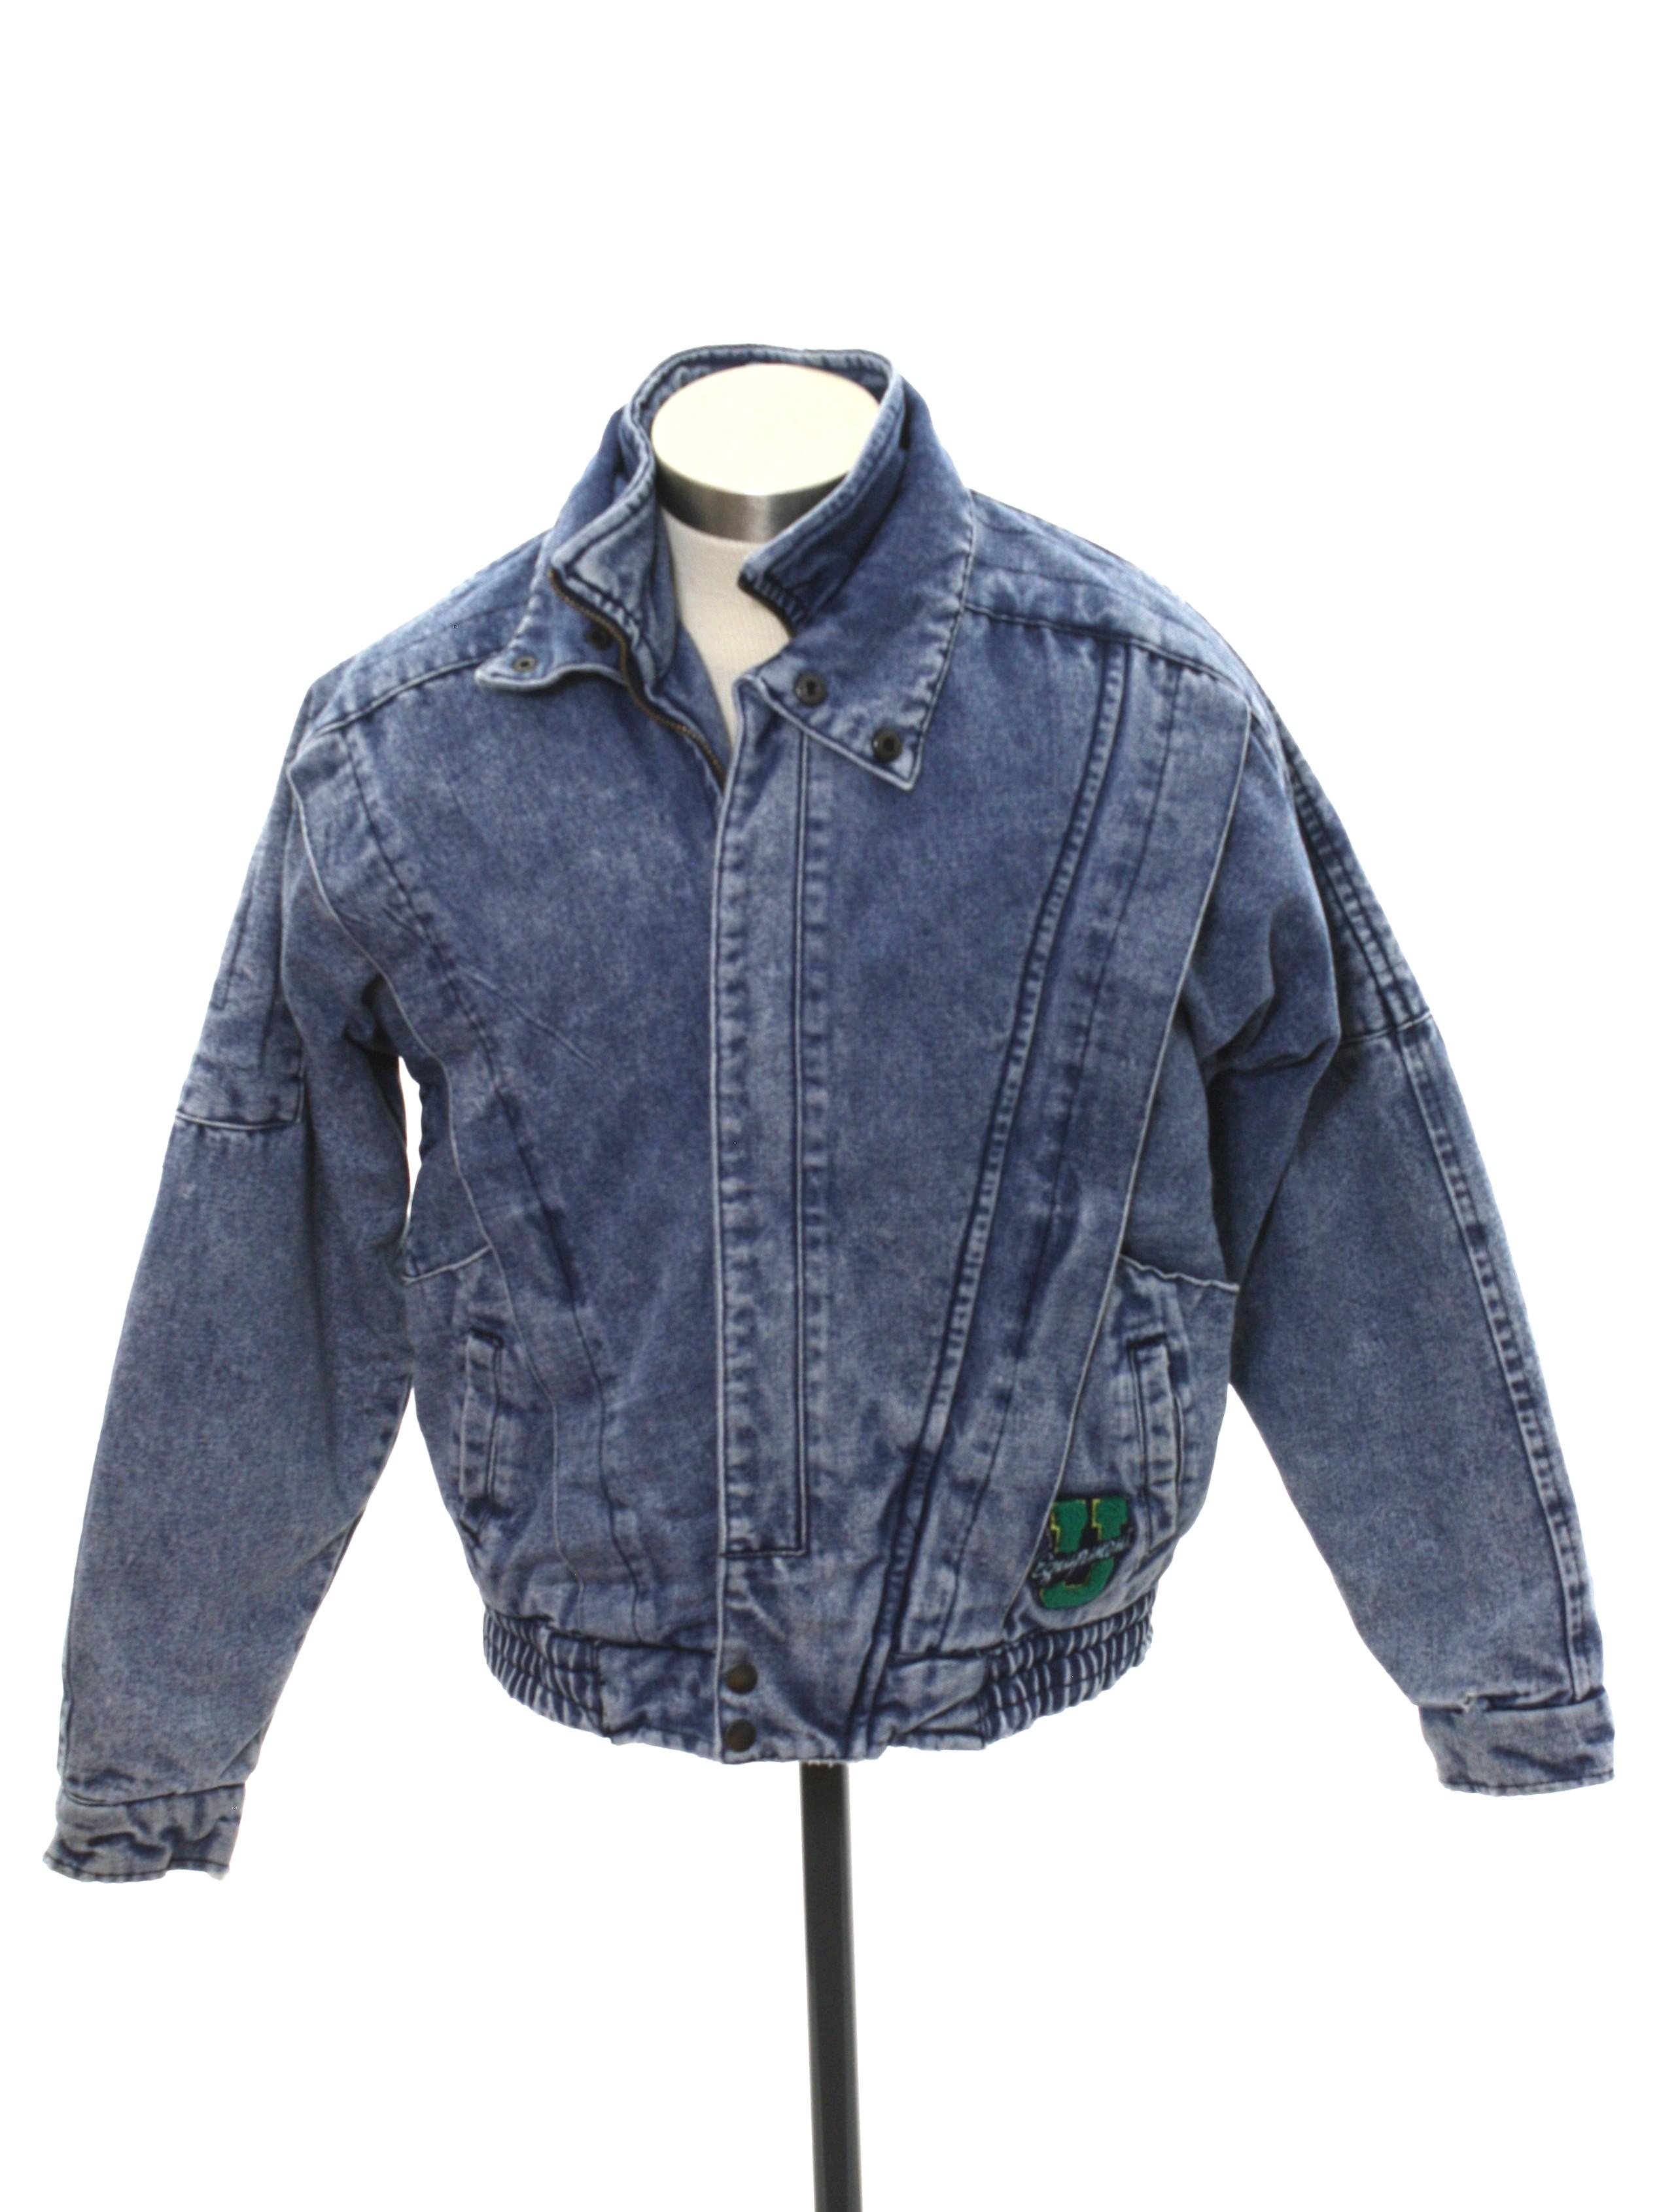 c9f9bc151 1980's Urban Equipment Mens or Boys Totally 80s Acid Washed Denim Jacket